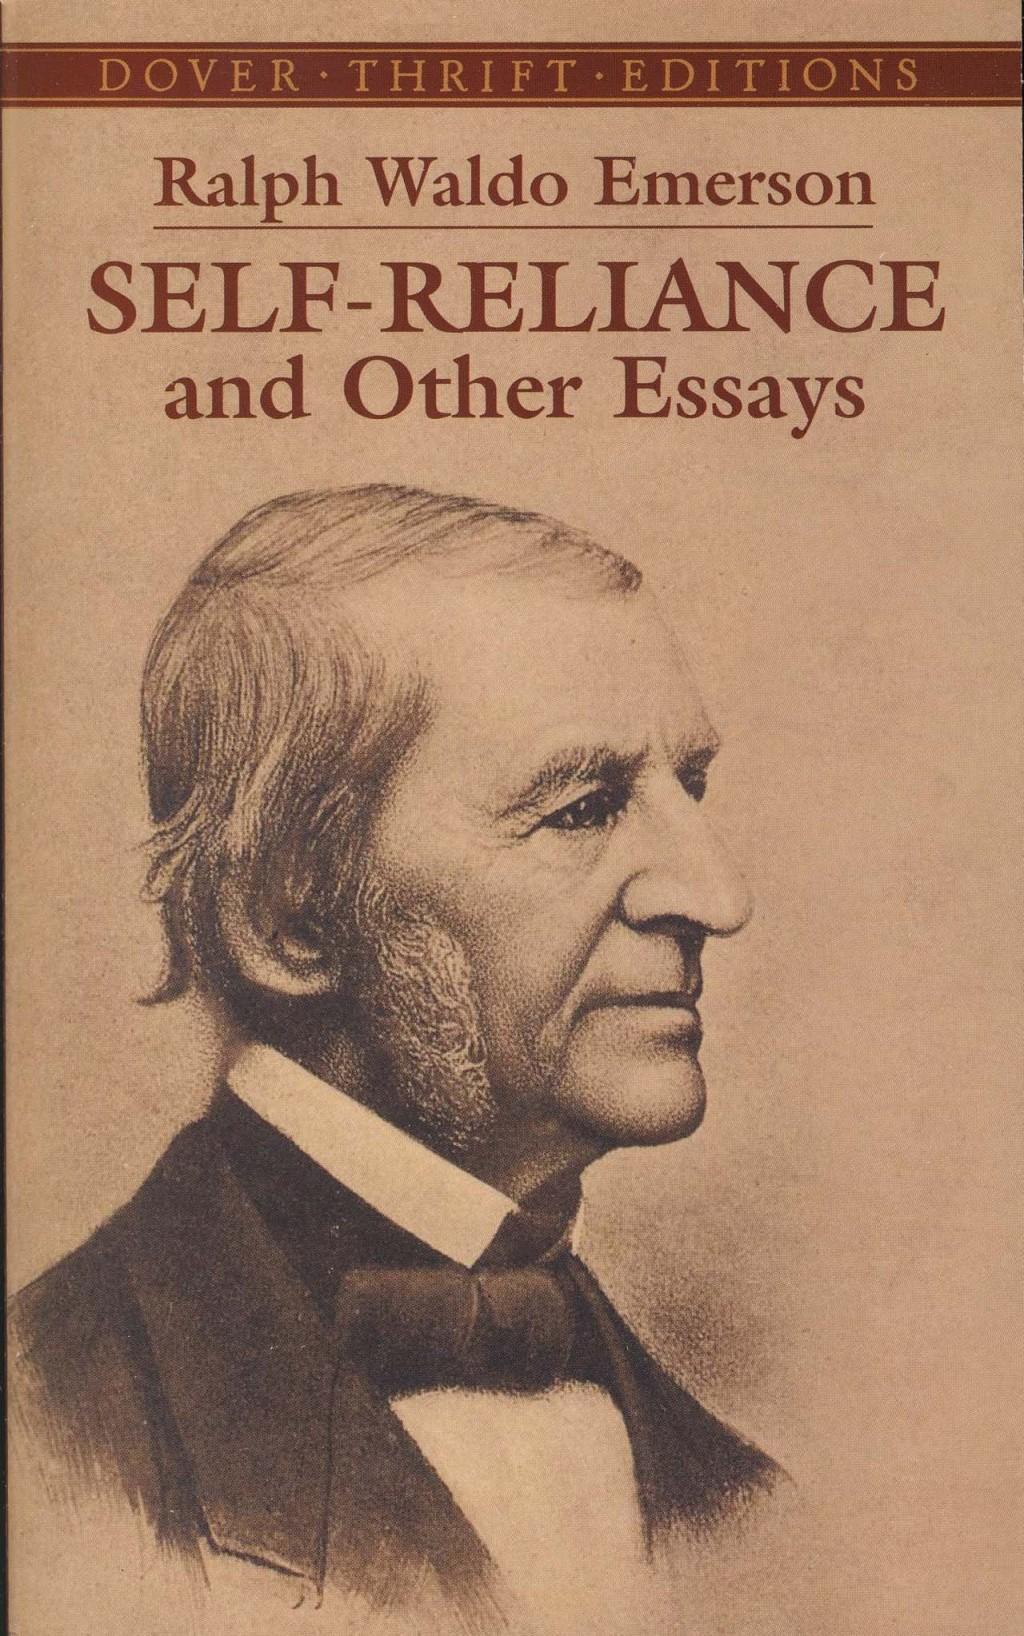 003 91btiwopxal Essay Example Emerson Dreaded Essays Ralph Pdf First Series Summary Waldo Nature Large